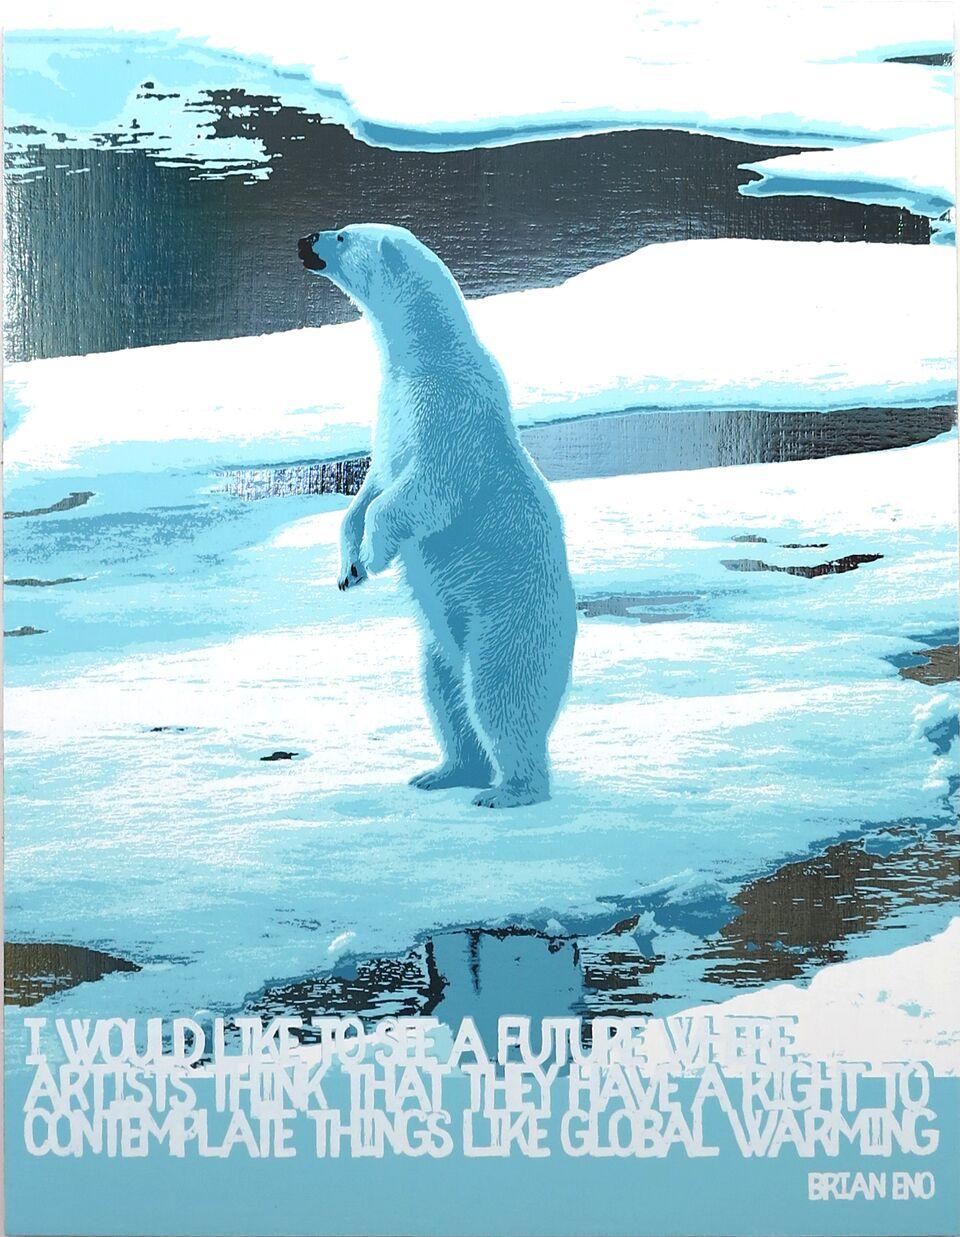 Polar Bear/Global Warming (Brian Eno)